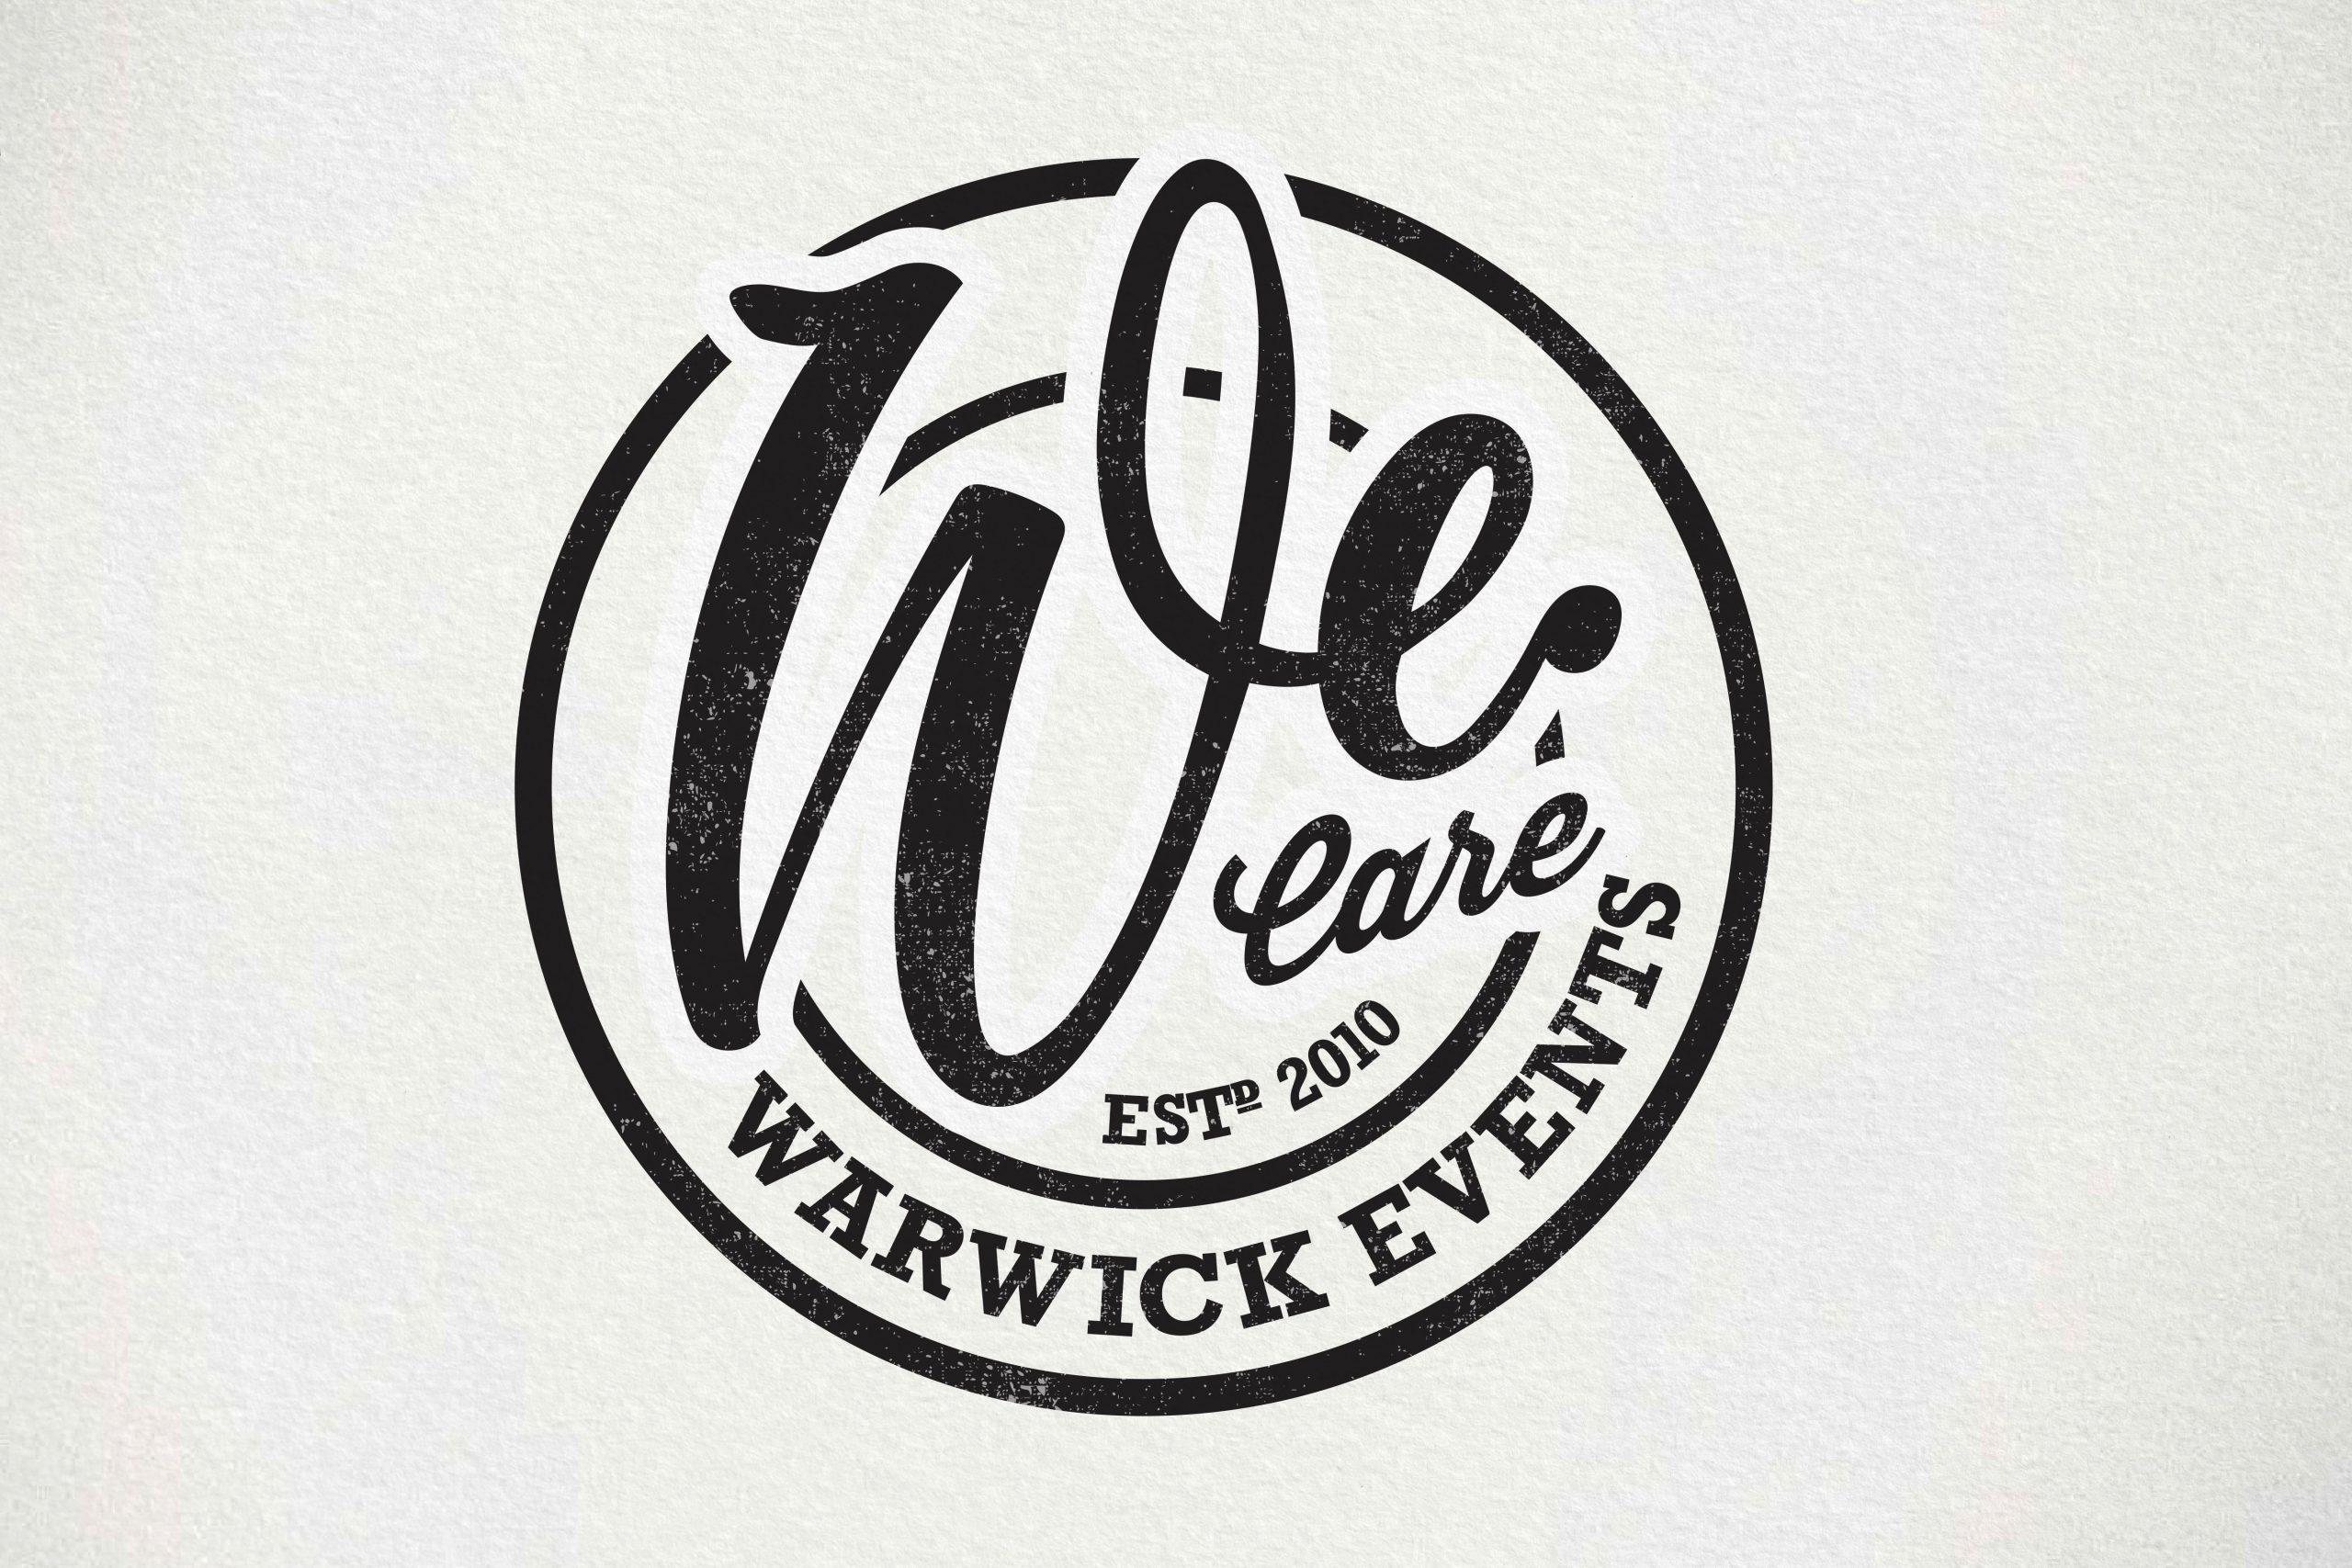 Warwick Events Branding